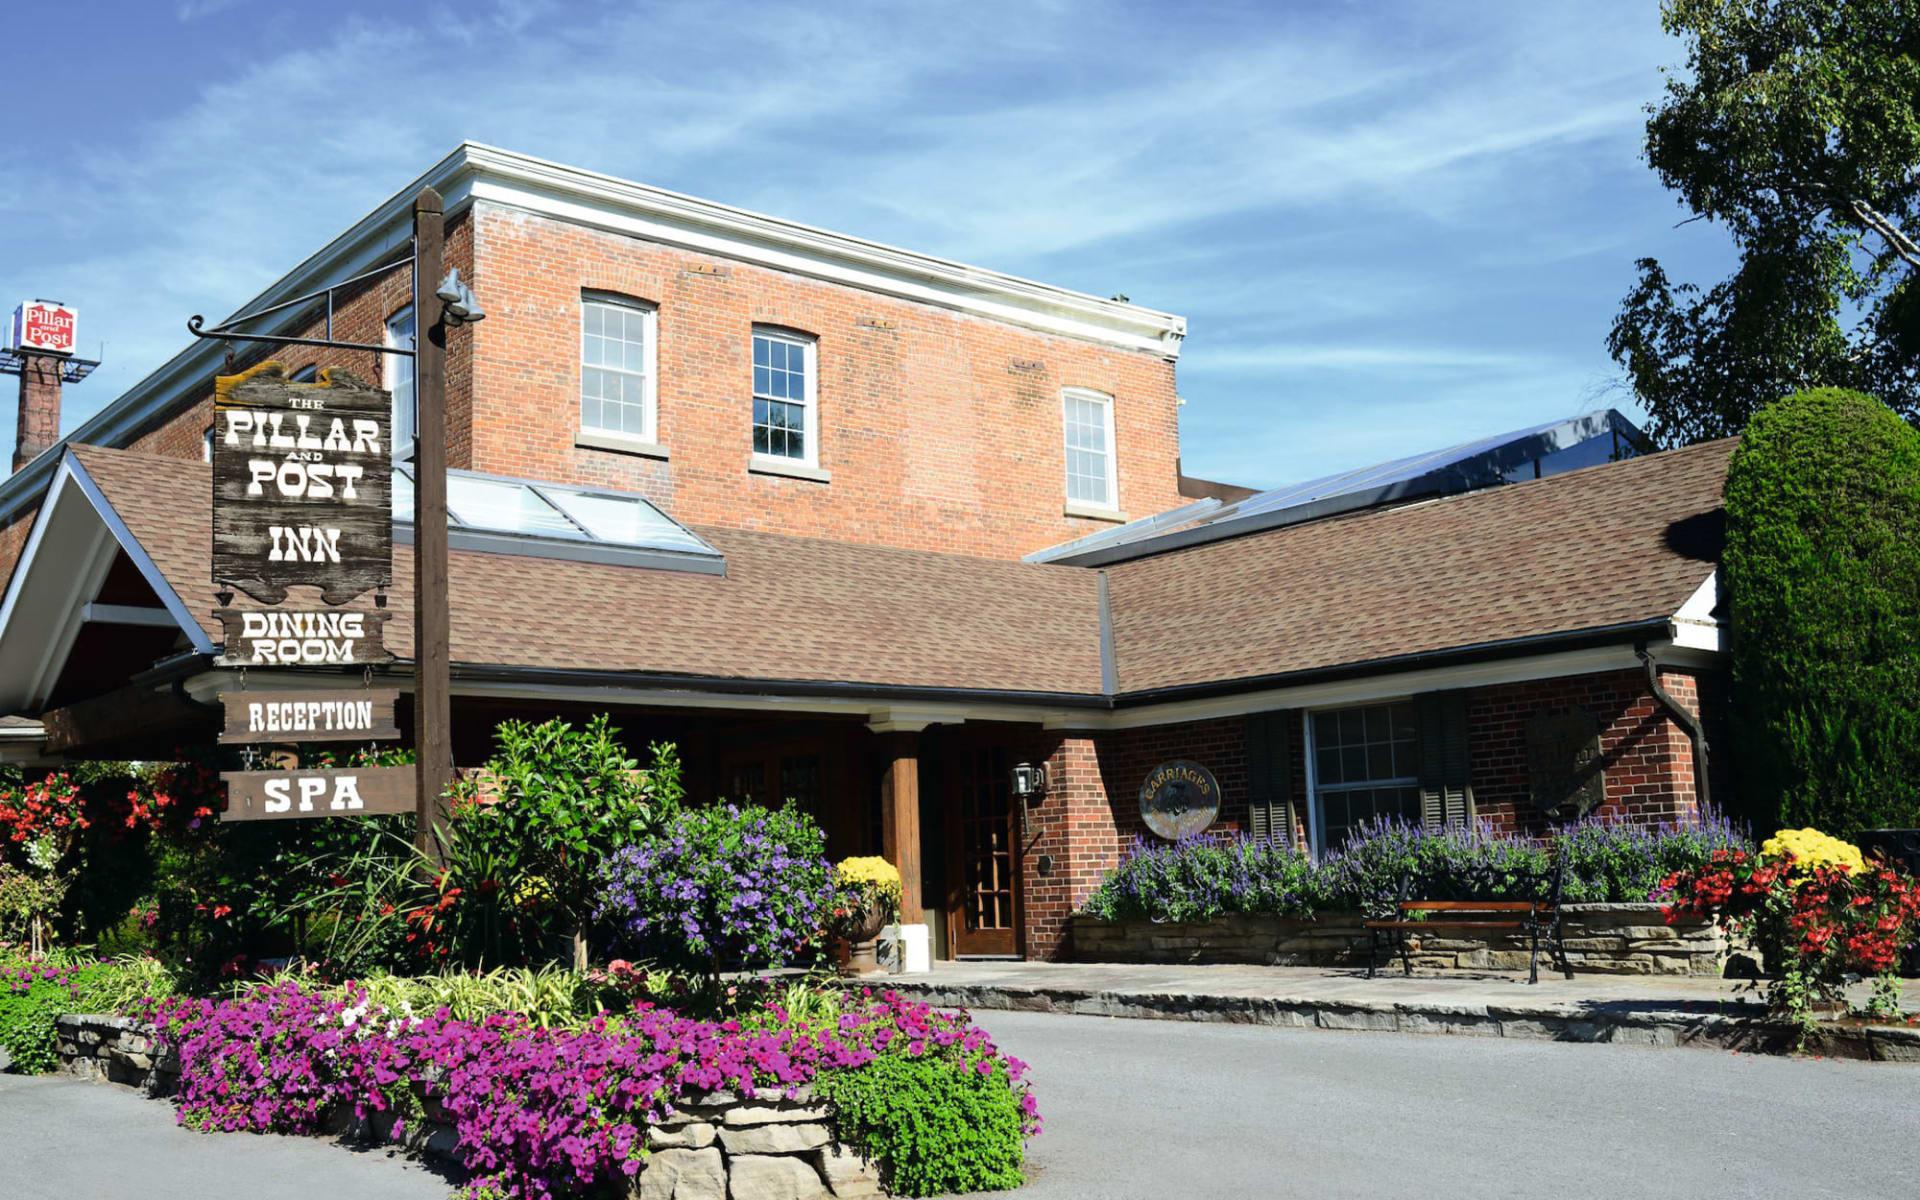 Pillar and Post Inn & Spa in Niagara on the Lake: _ exterior Pillar and Post Inn & Spa Sicht auf Eingang mit Schild